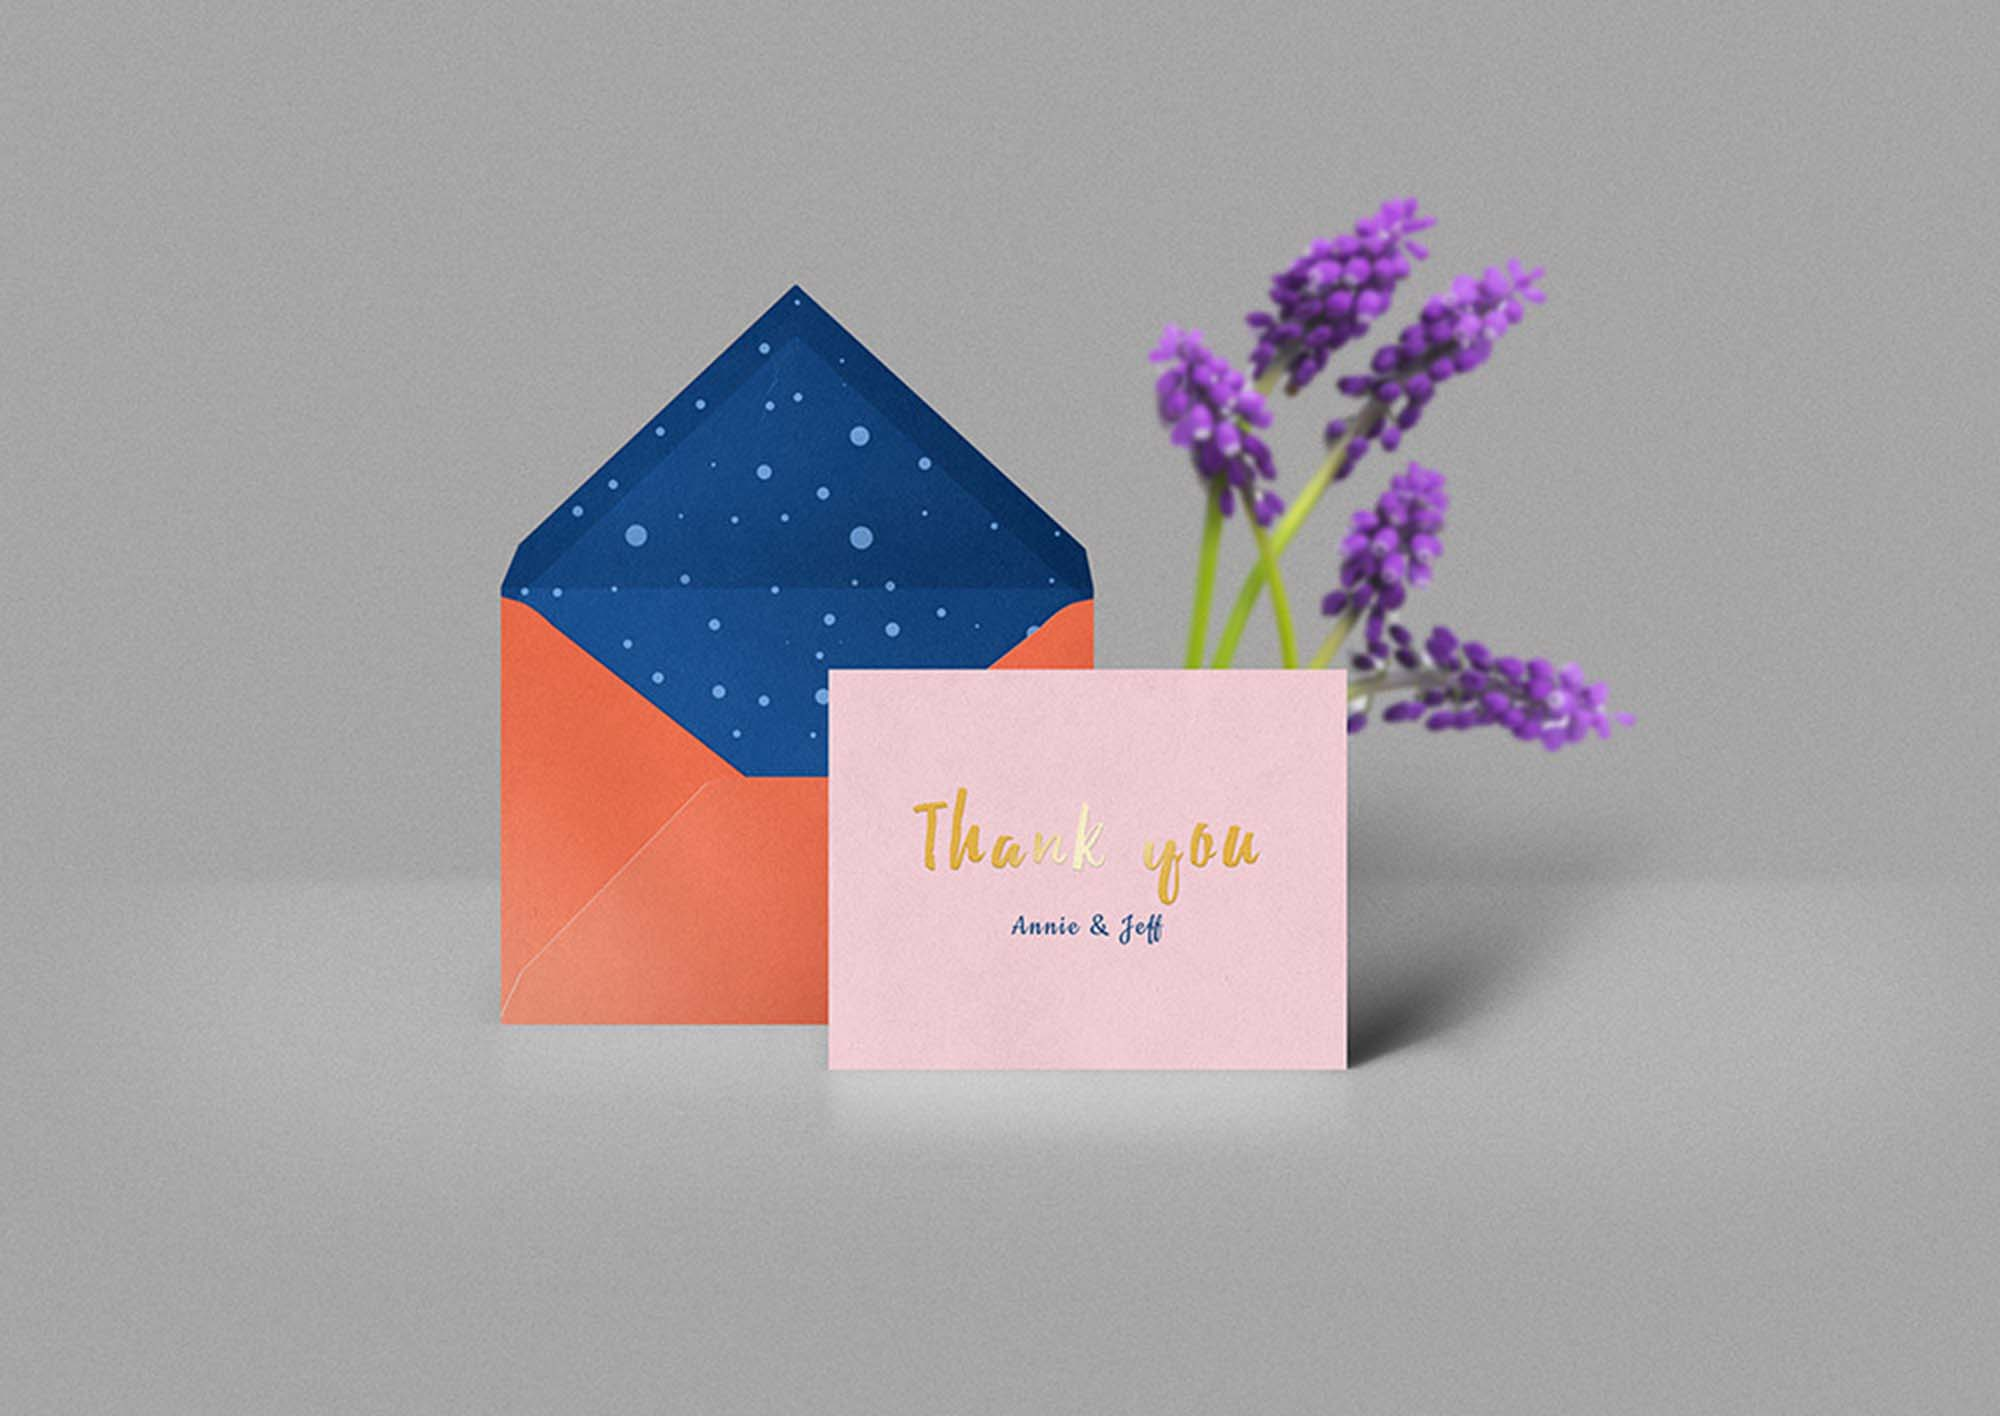 Thank You Card & Envelope Mockup